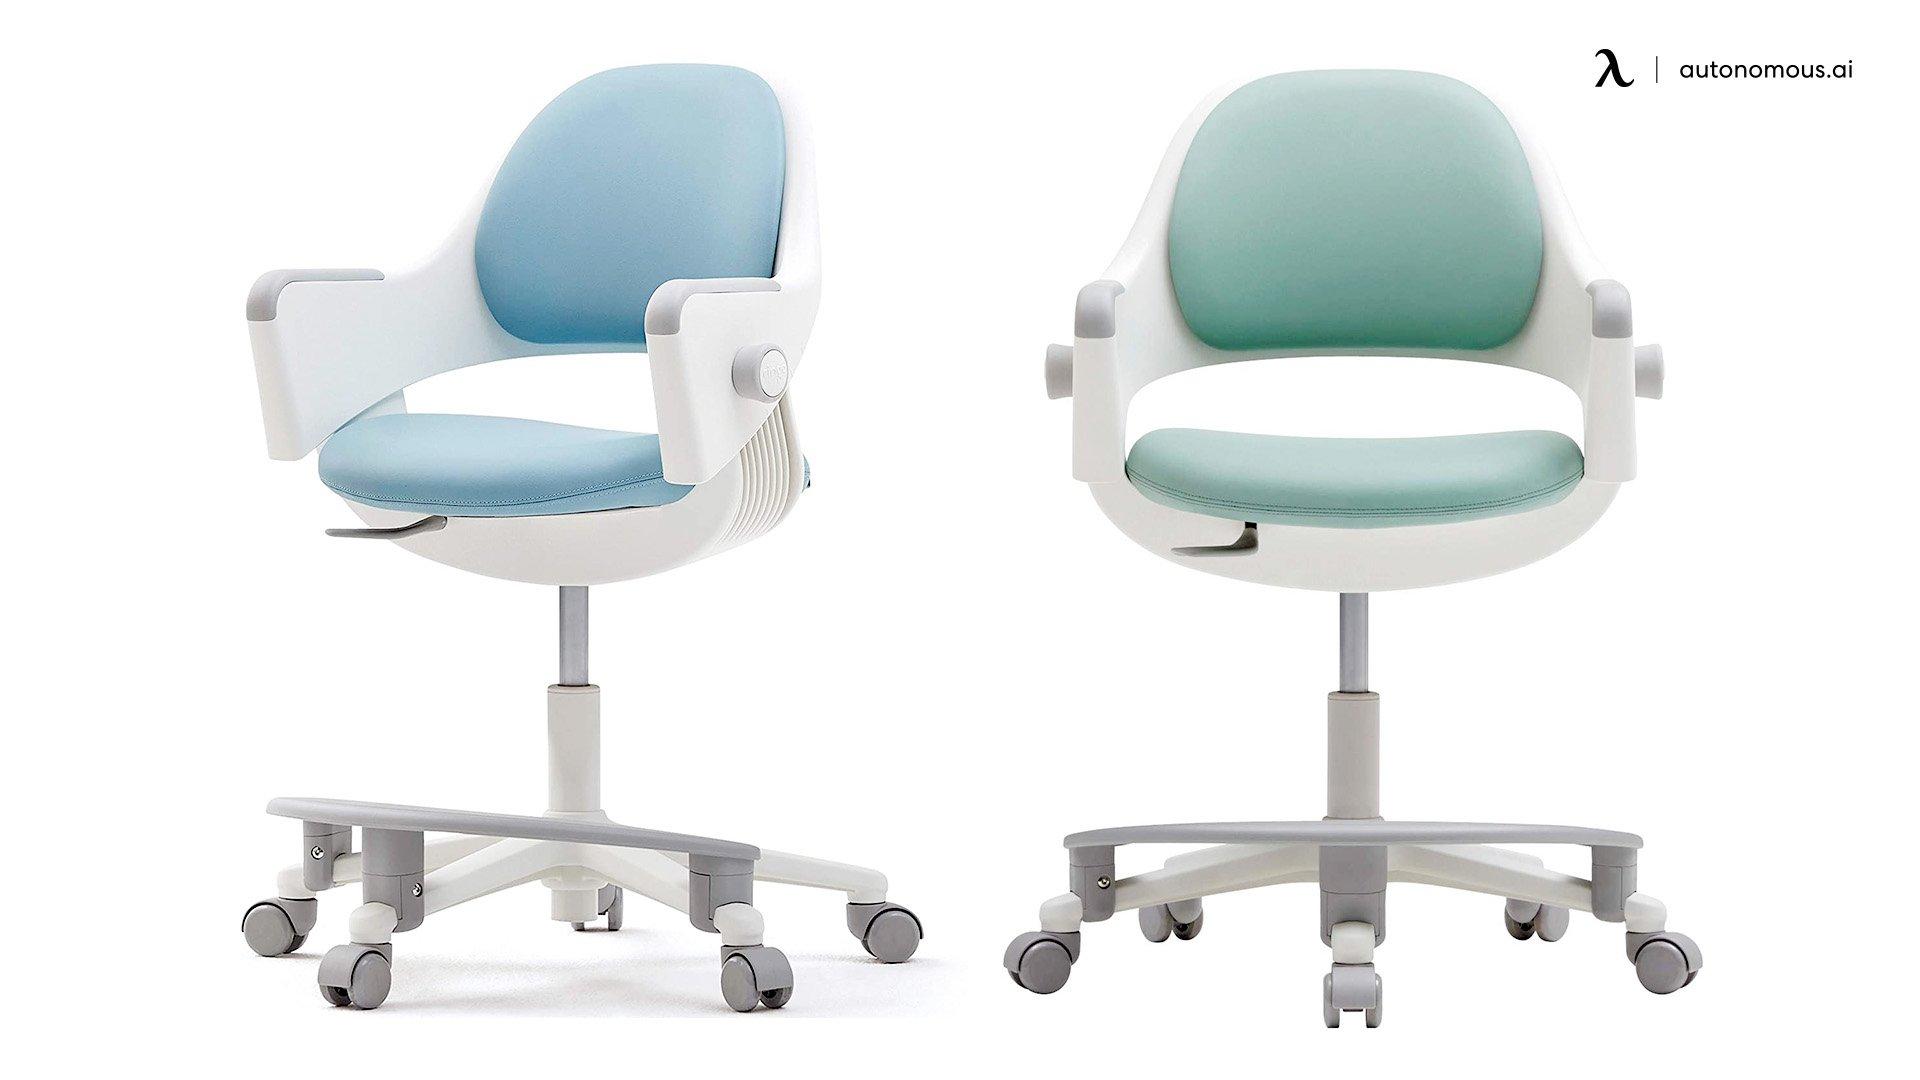 SitRite Ergonomic Desk Chair